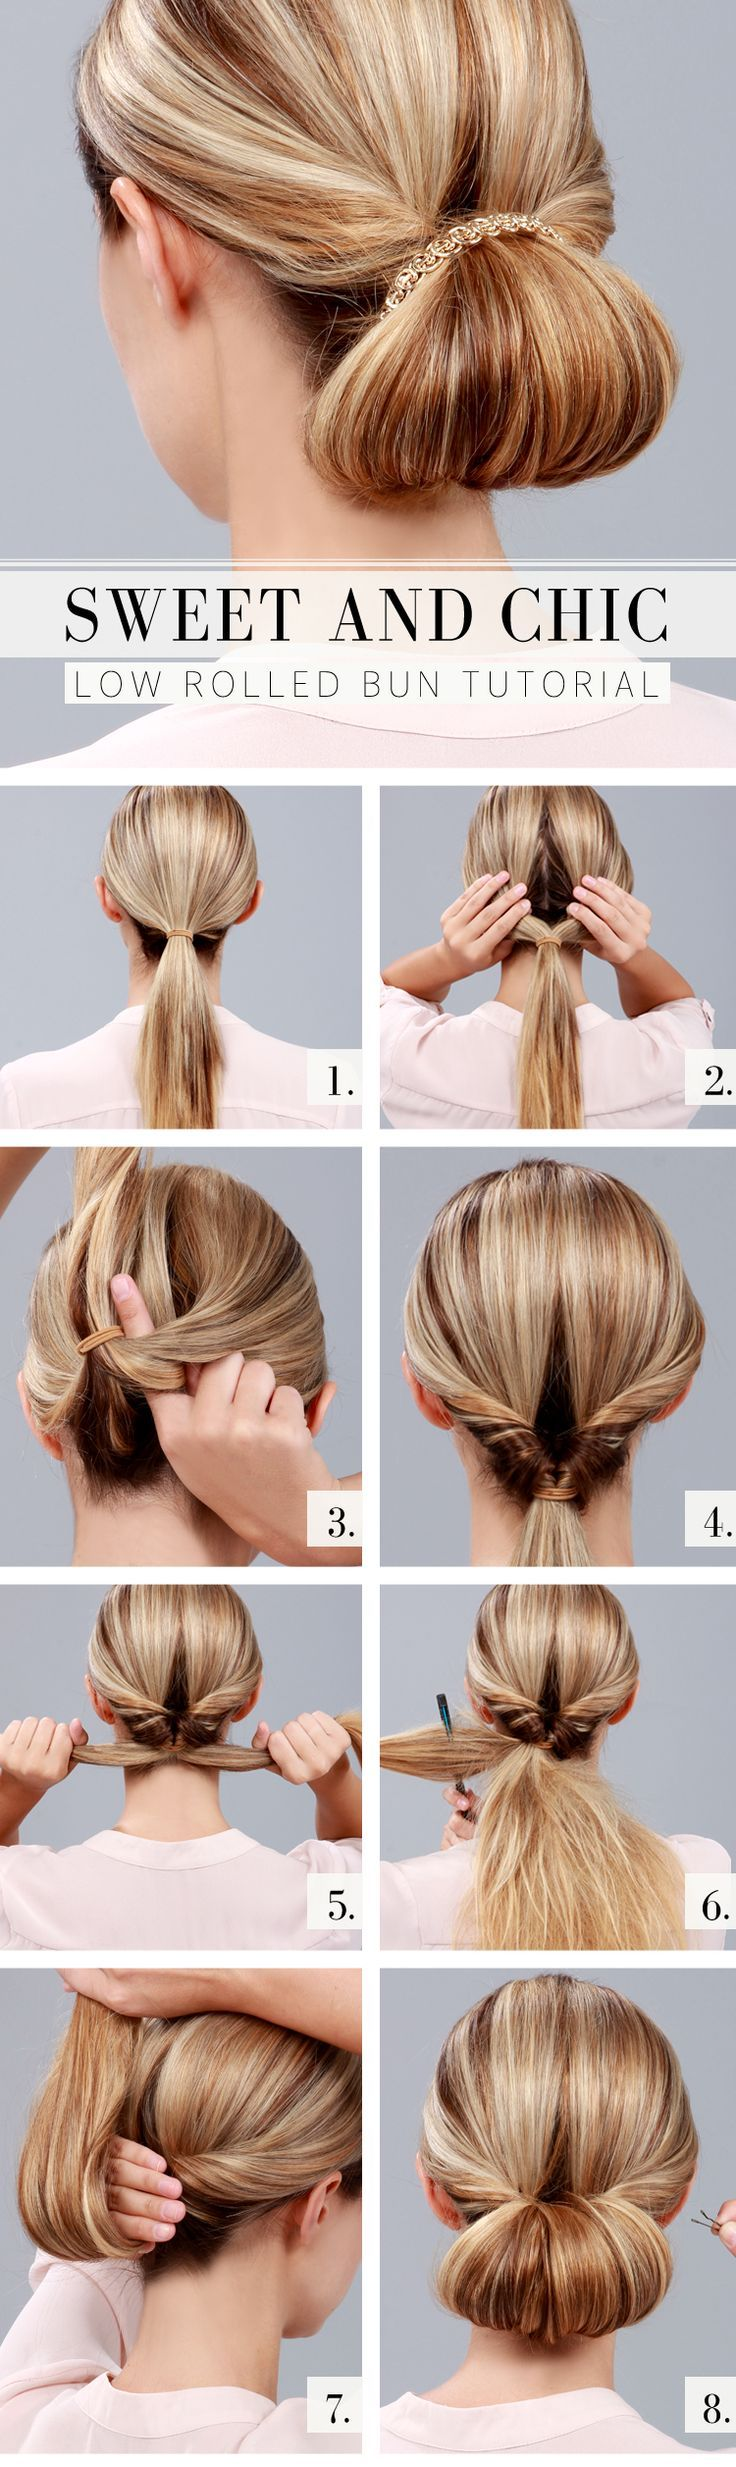 Sweet and chic :) #hair #diy #tutorial